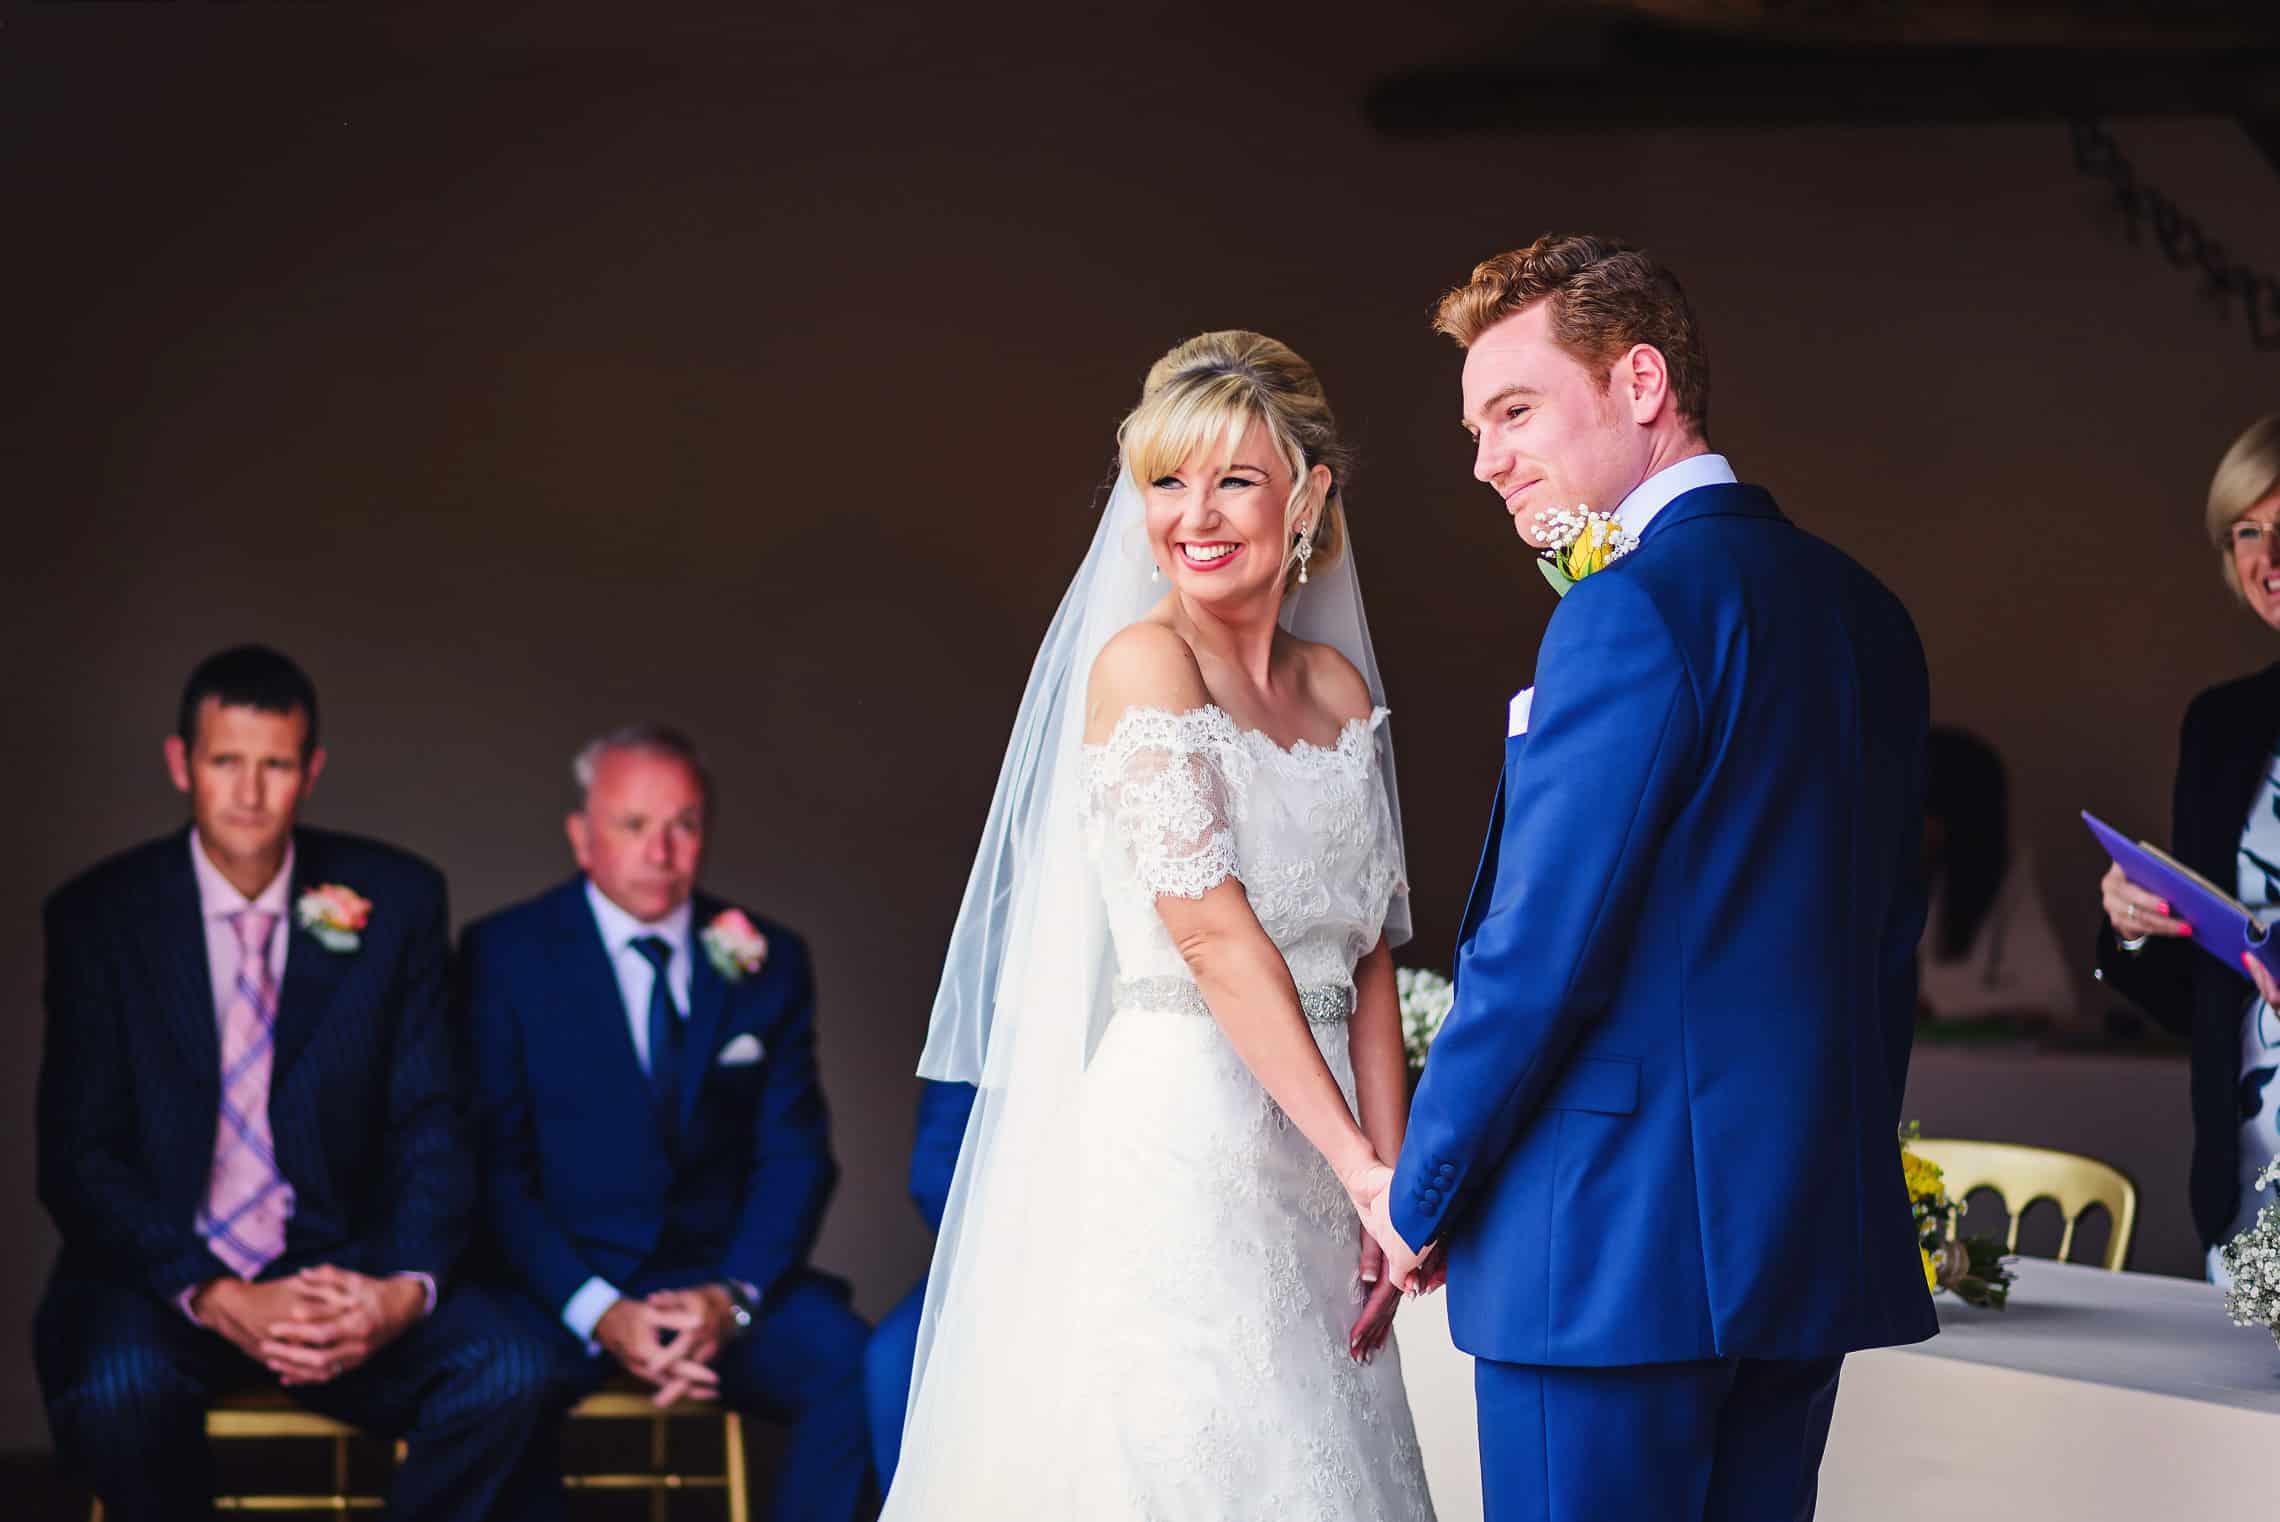 blake_hall_wedding_bc_justin_bailey_photography_025